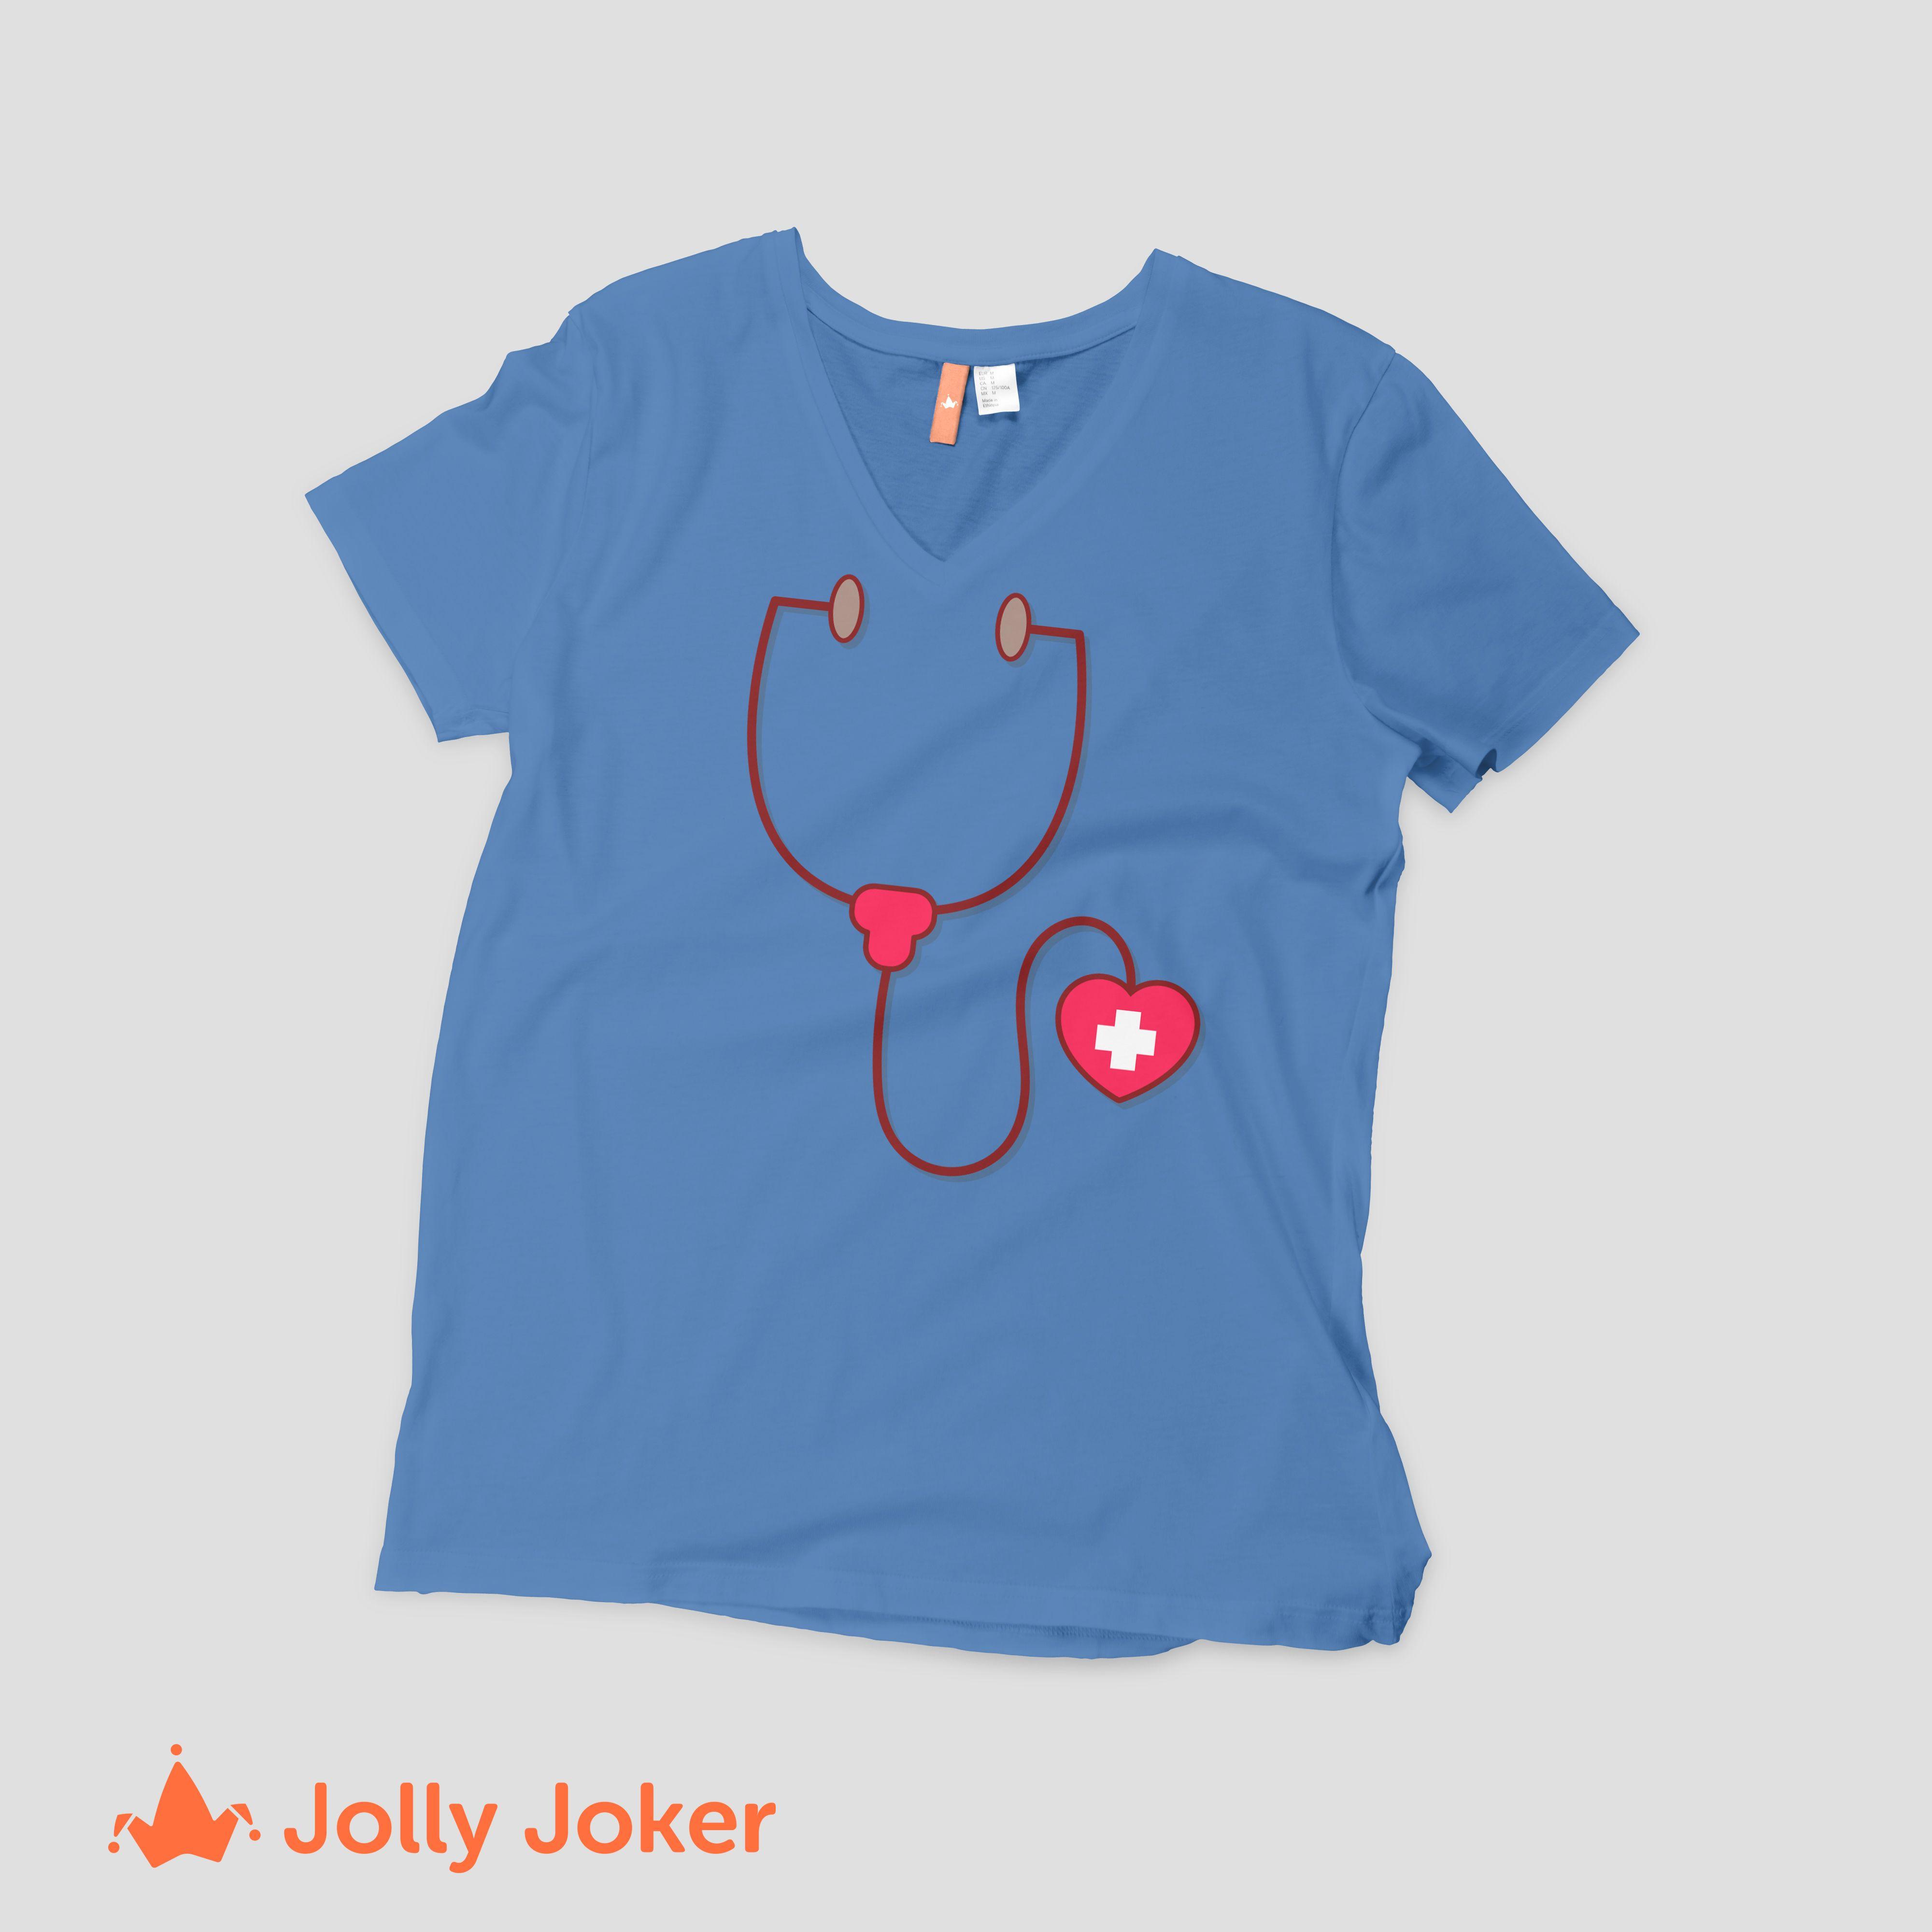 1d2c7d4e3 ¿Estas buscando camisetas para el hospital